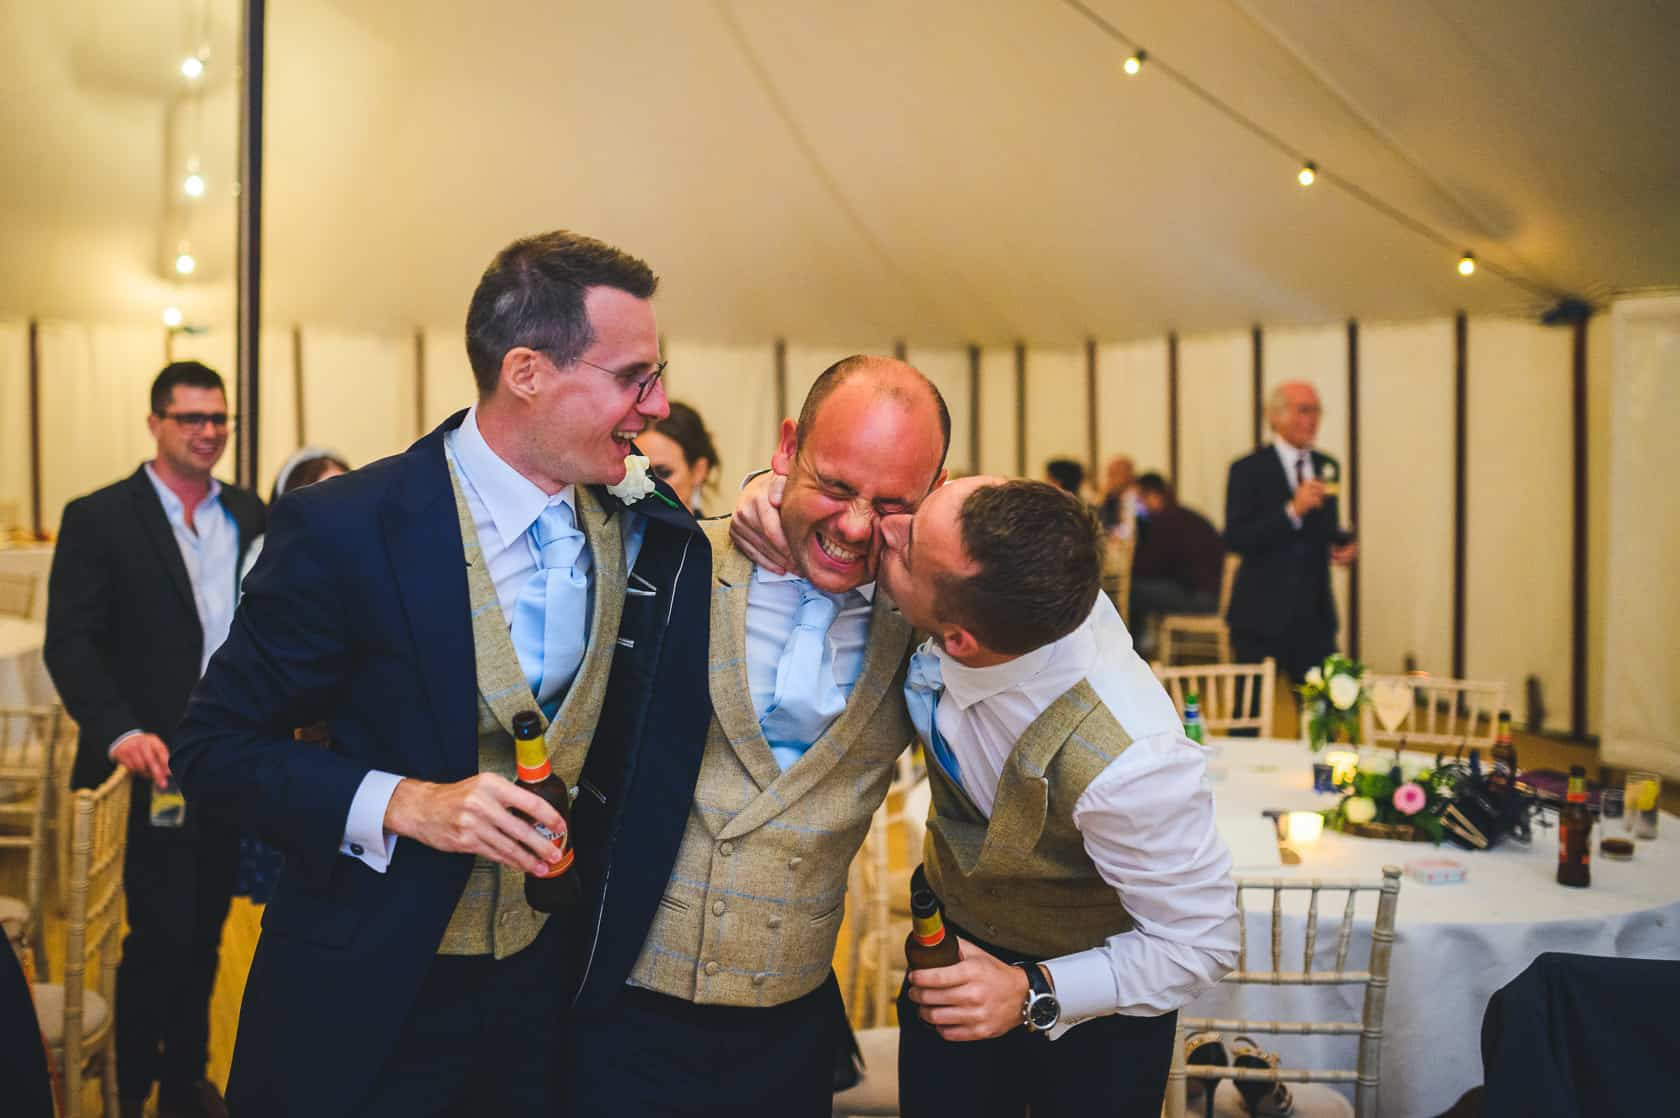 Best_Wedding_Photography_2019_Wedding-Photographer-Essex_070